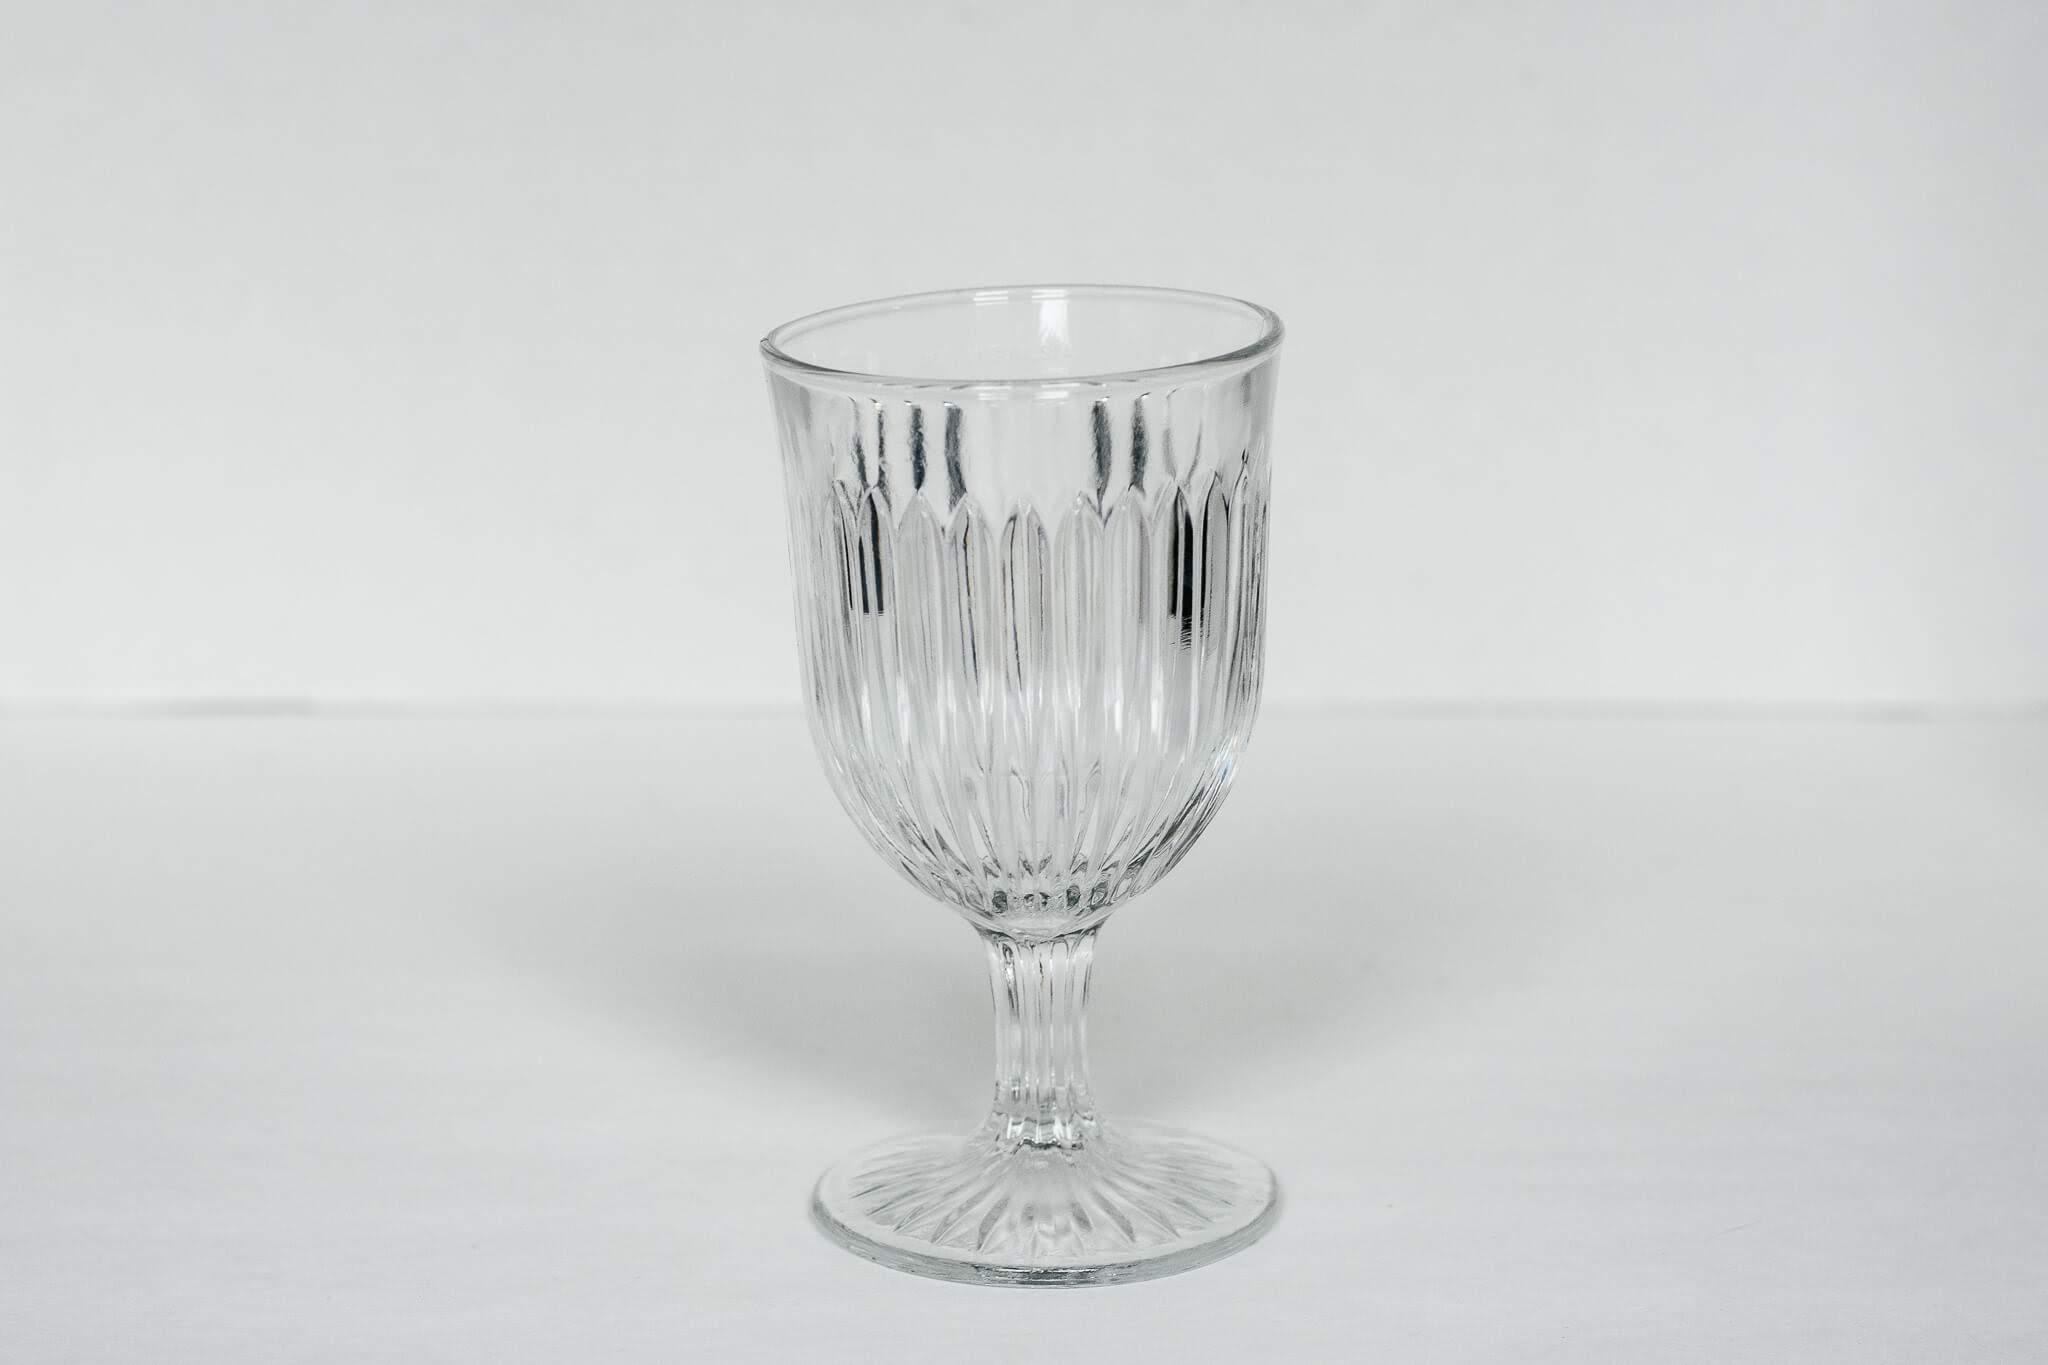 Glassware-35.jpg